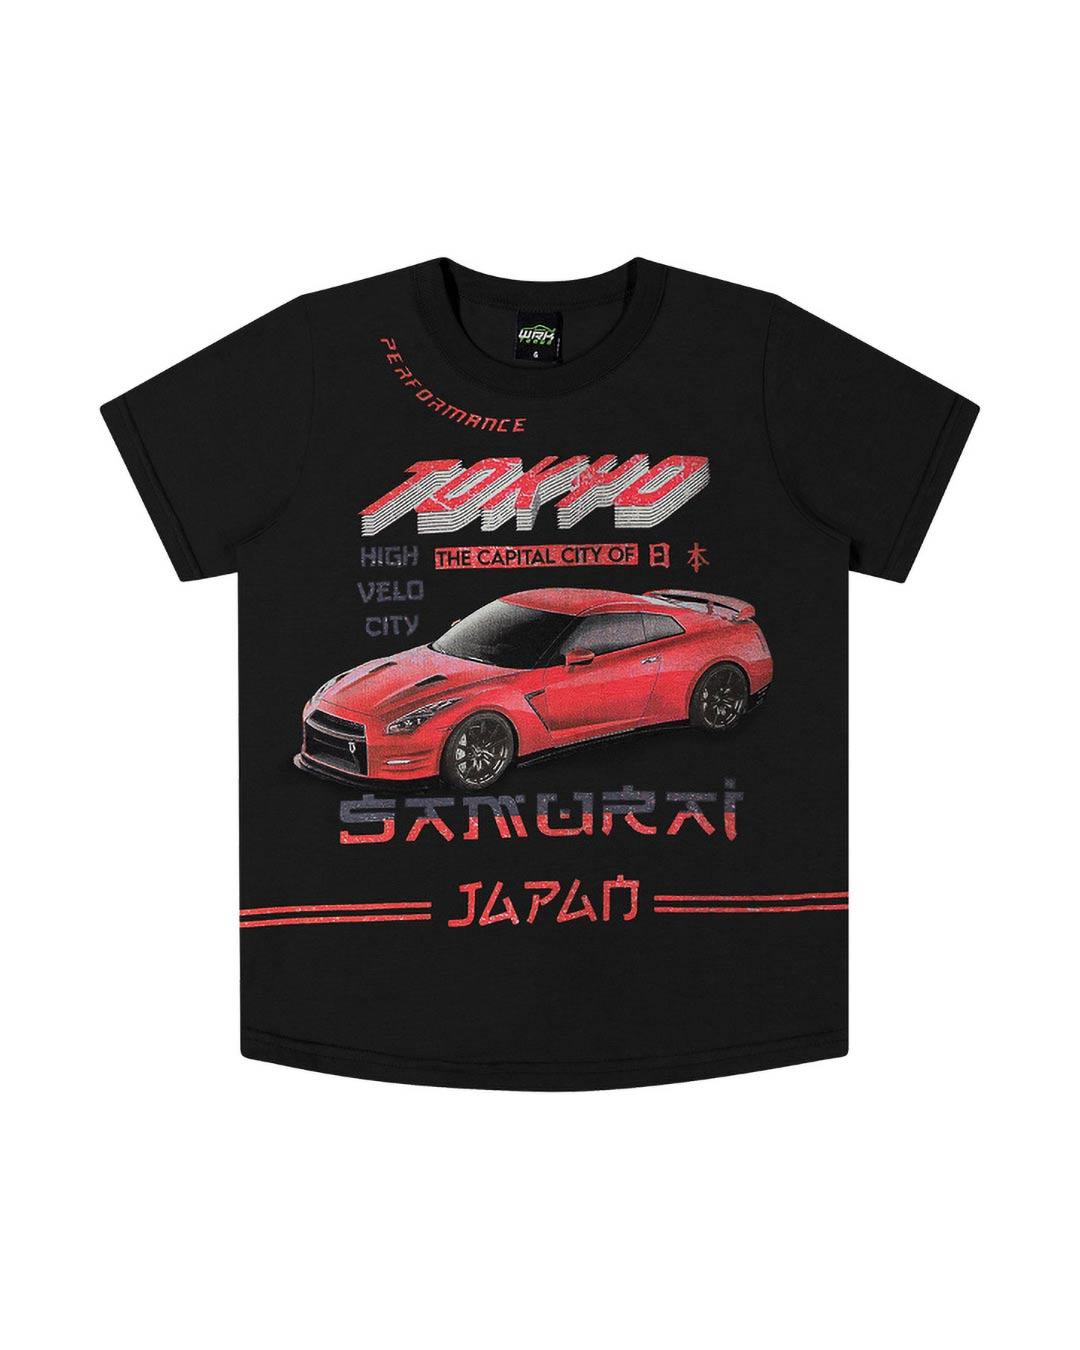 Camiseta Infantil Tokyo Samurai - WRK